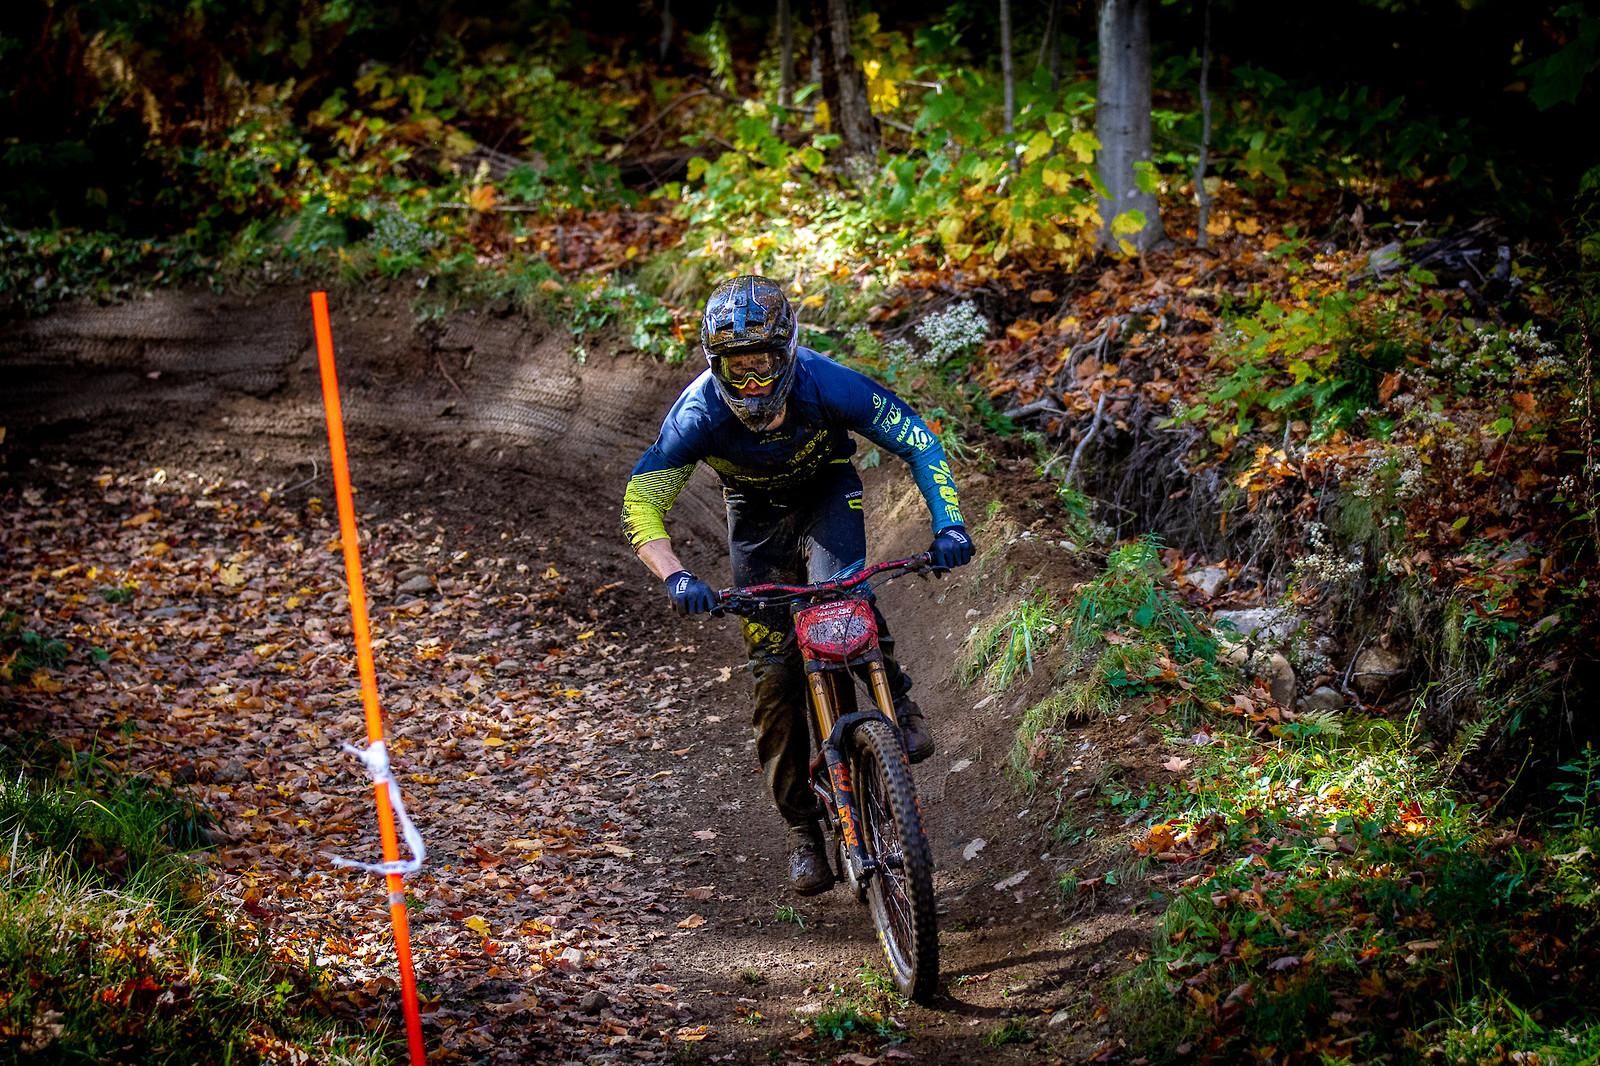 Isaac Allaire - JackRice - Mountain Biking Pictures - Vital MTB